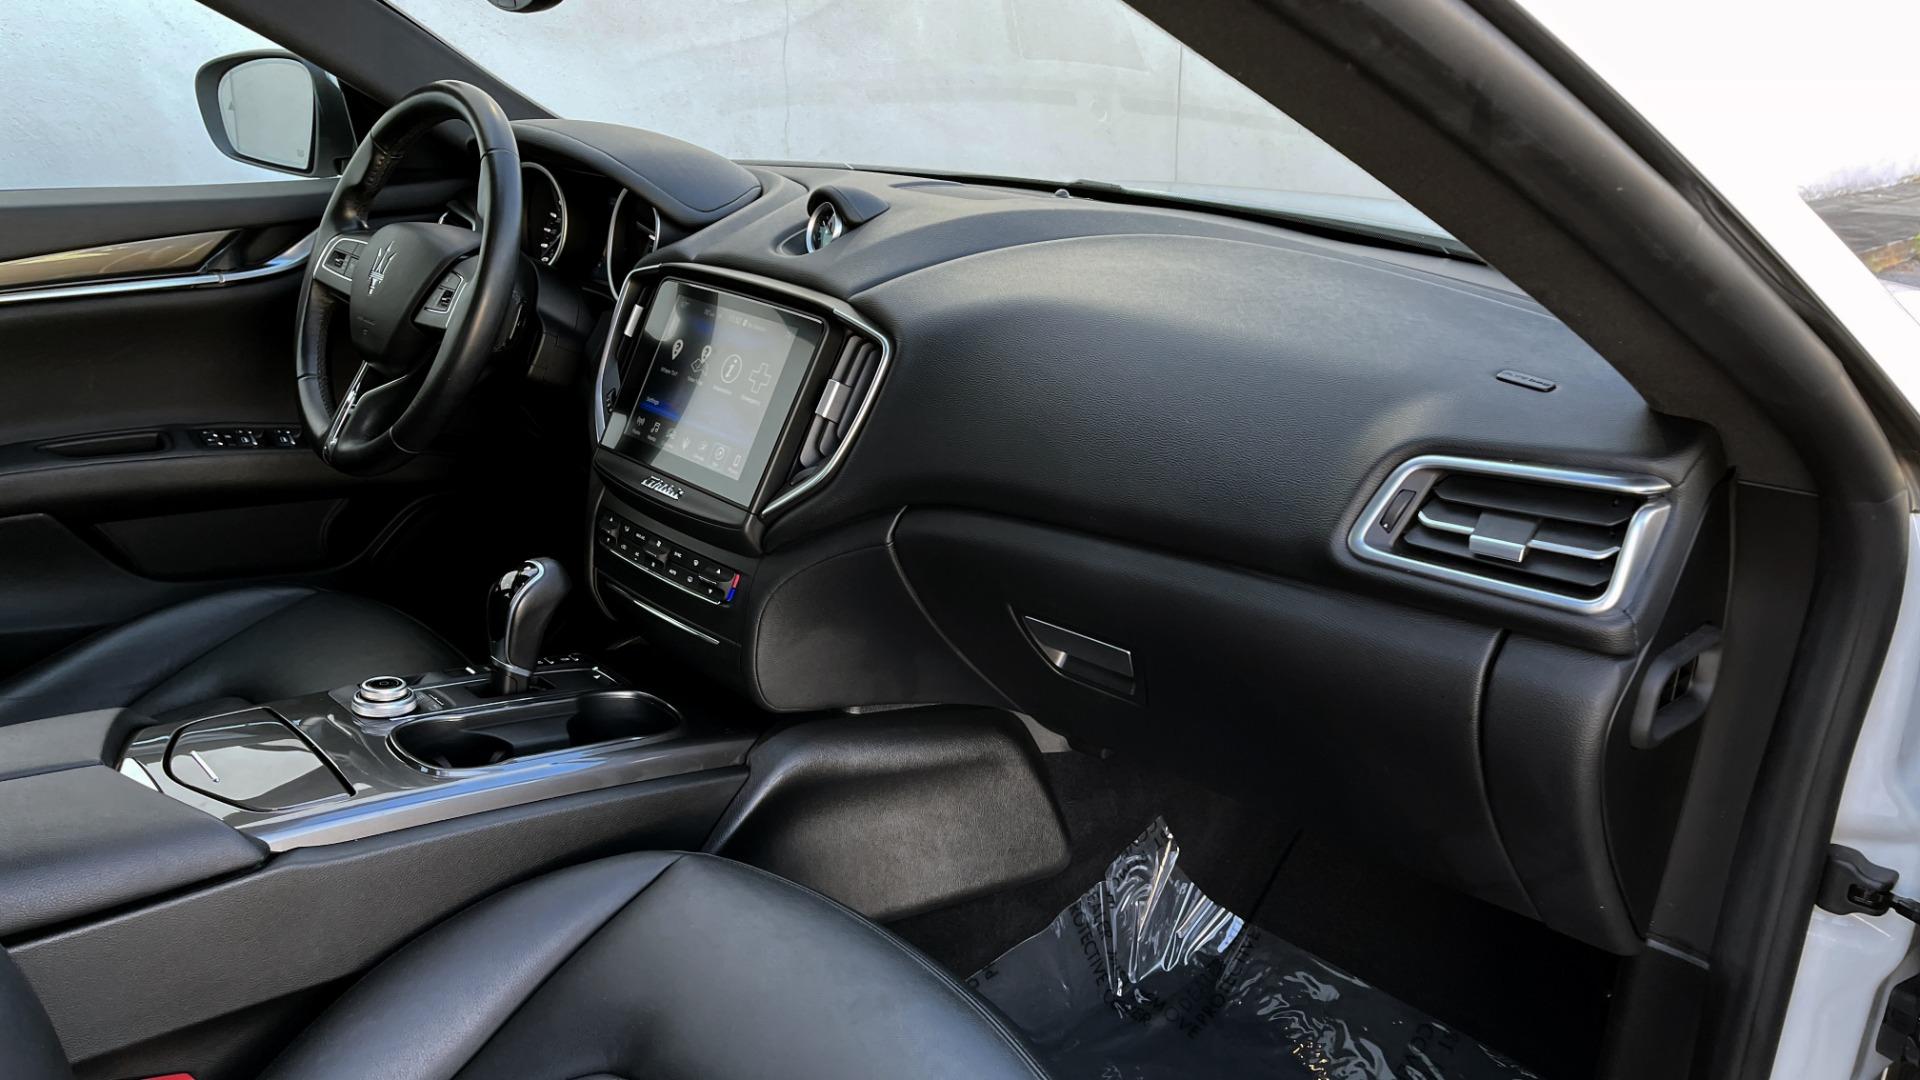 Used 2018 Maserati GHIBLI SEDAN / RWD / 3.0L V6 / SUNROOF / NAV / REARVIEW for sale $42,995 at Formula Imports in Charlotte NC 28227 57